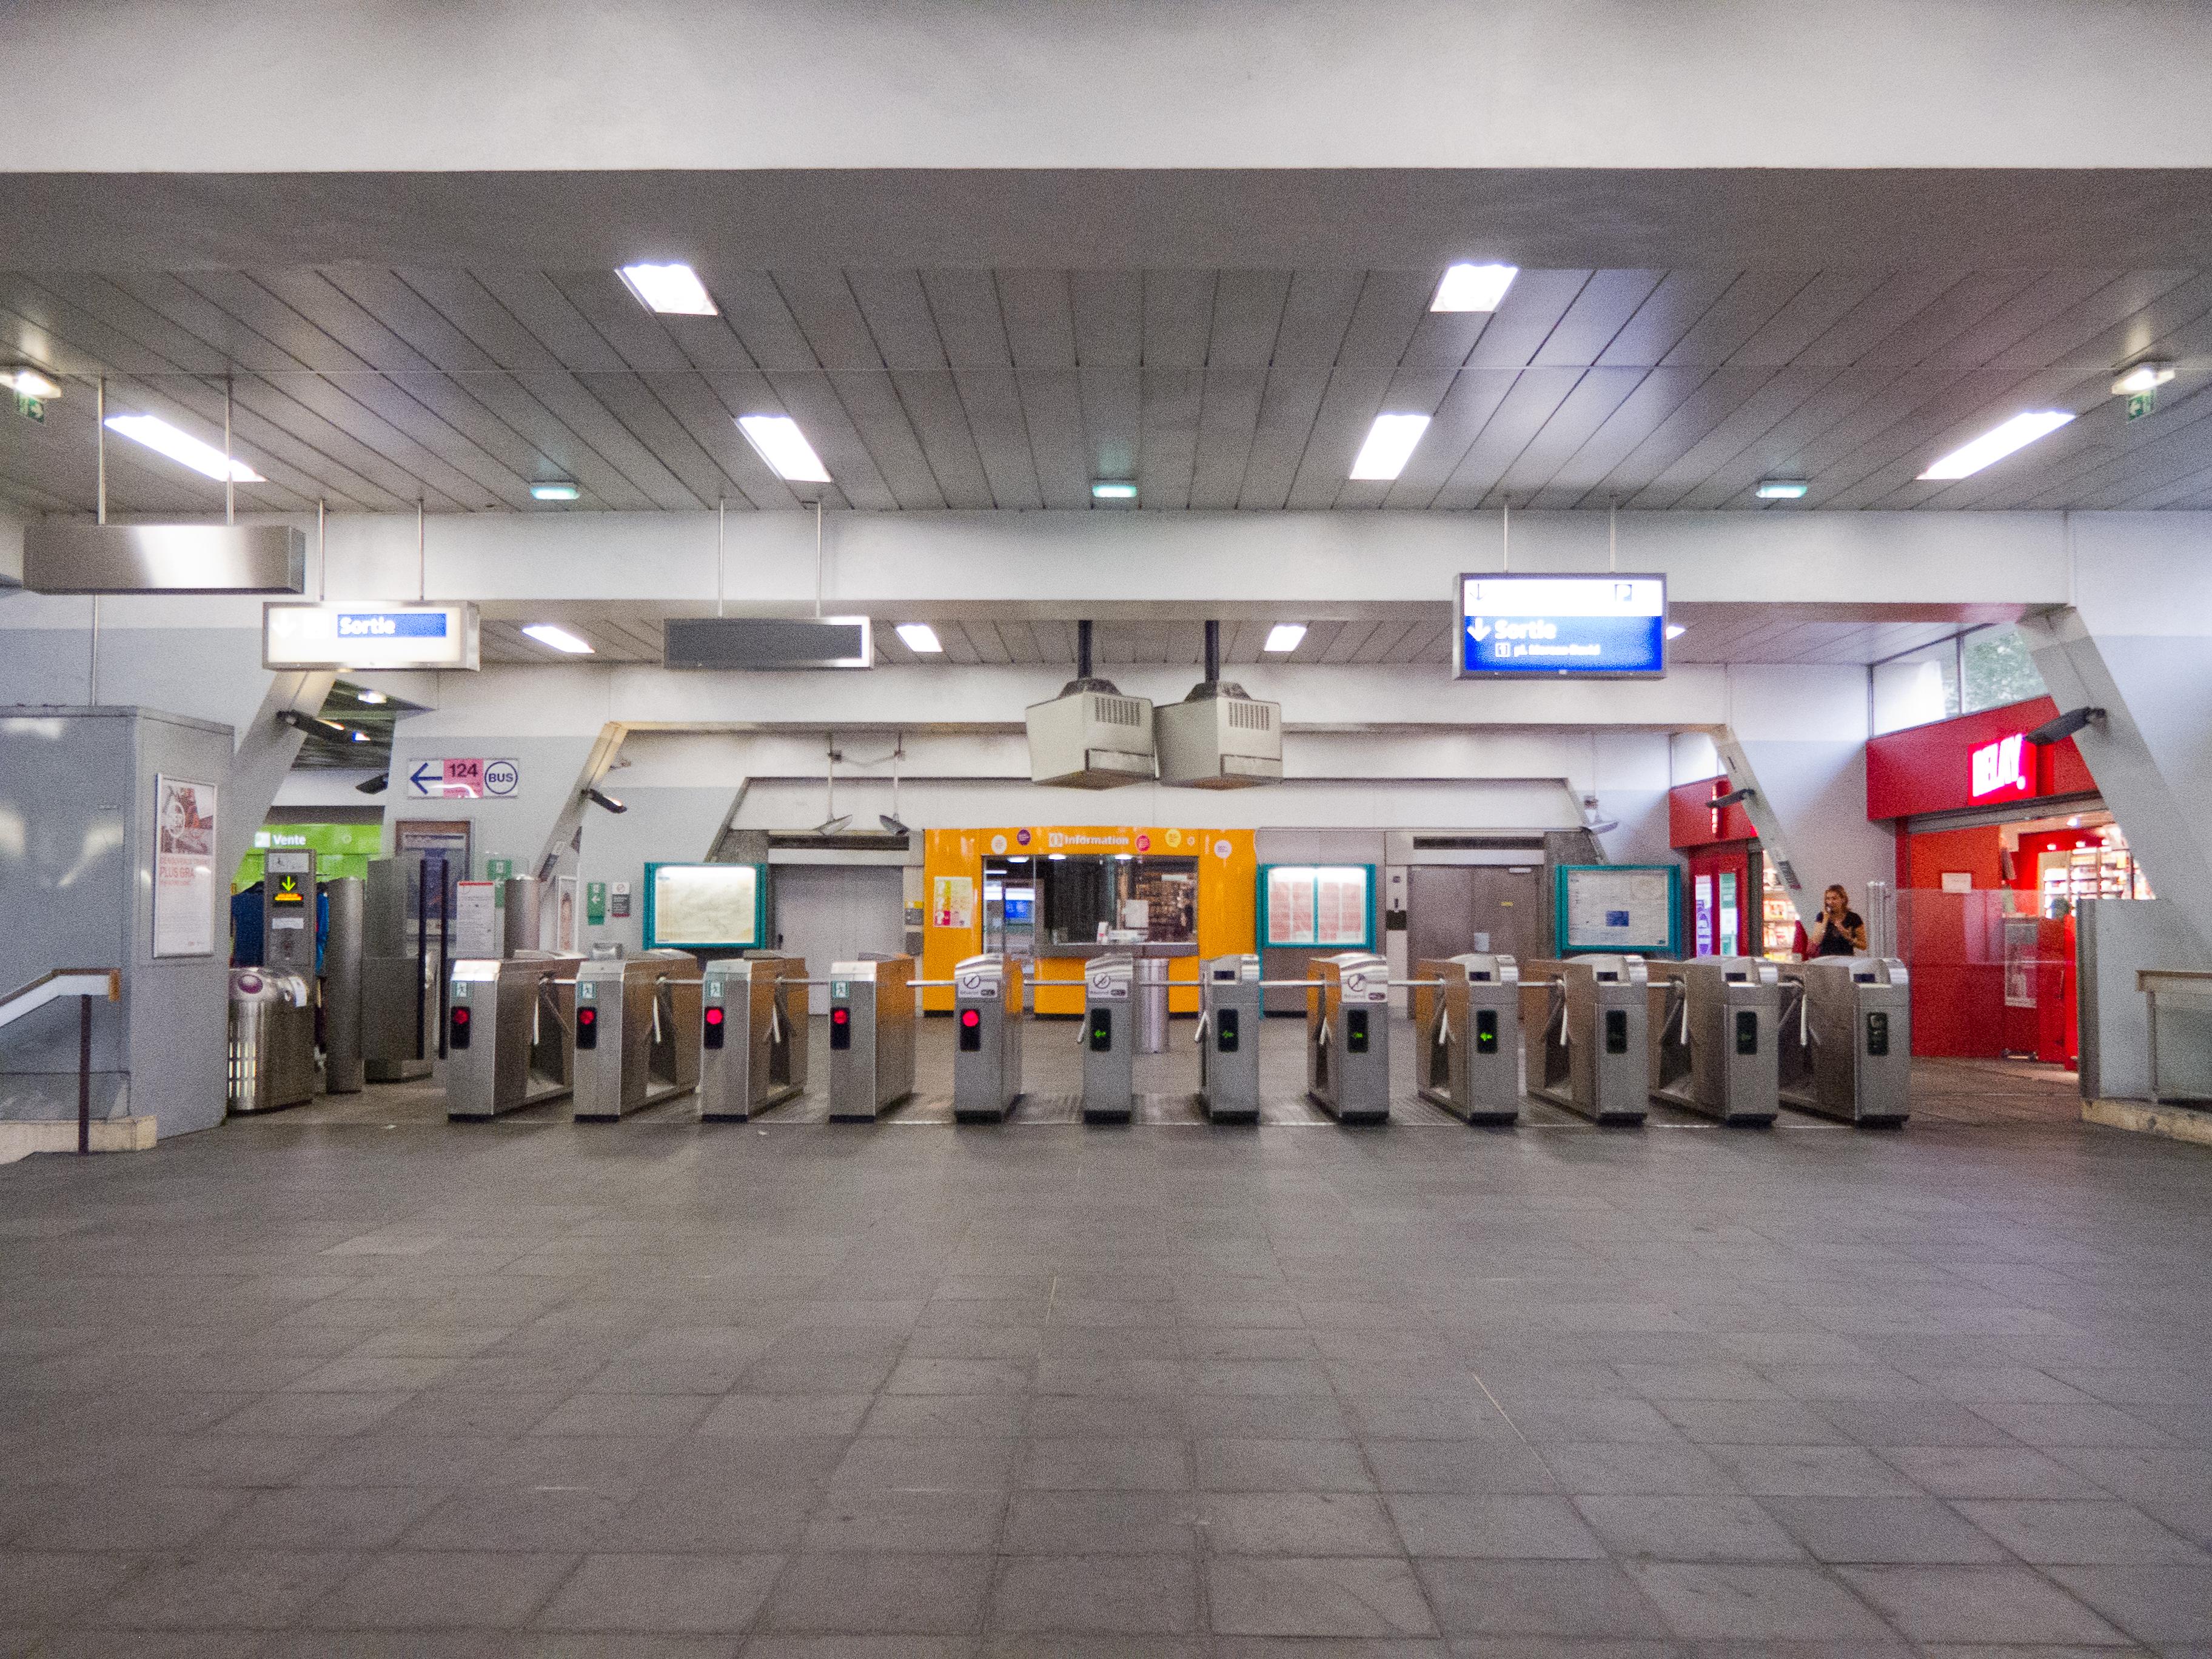 Description Gare RER de FontenaysousBois  20120626  IMG 2779jpg ~ Rer Aulnay Sous Bois